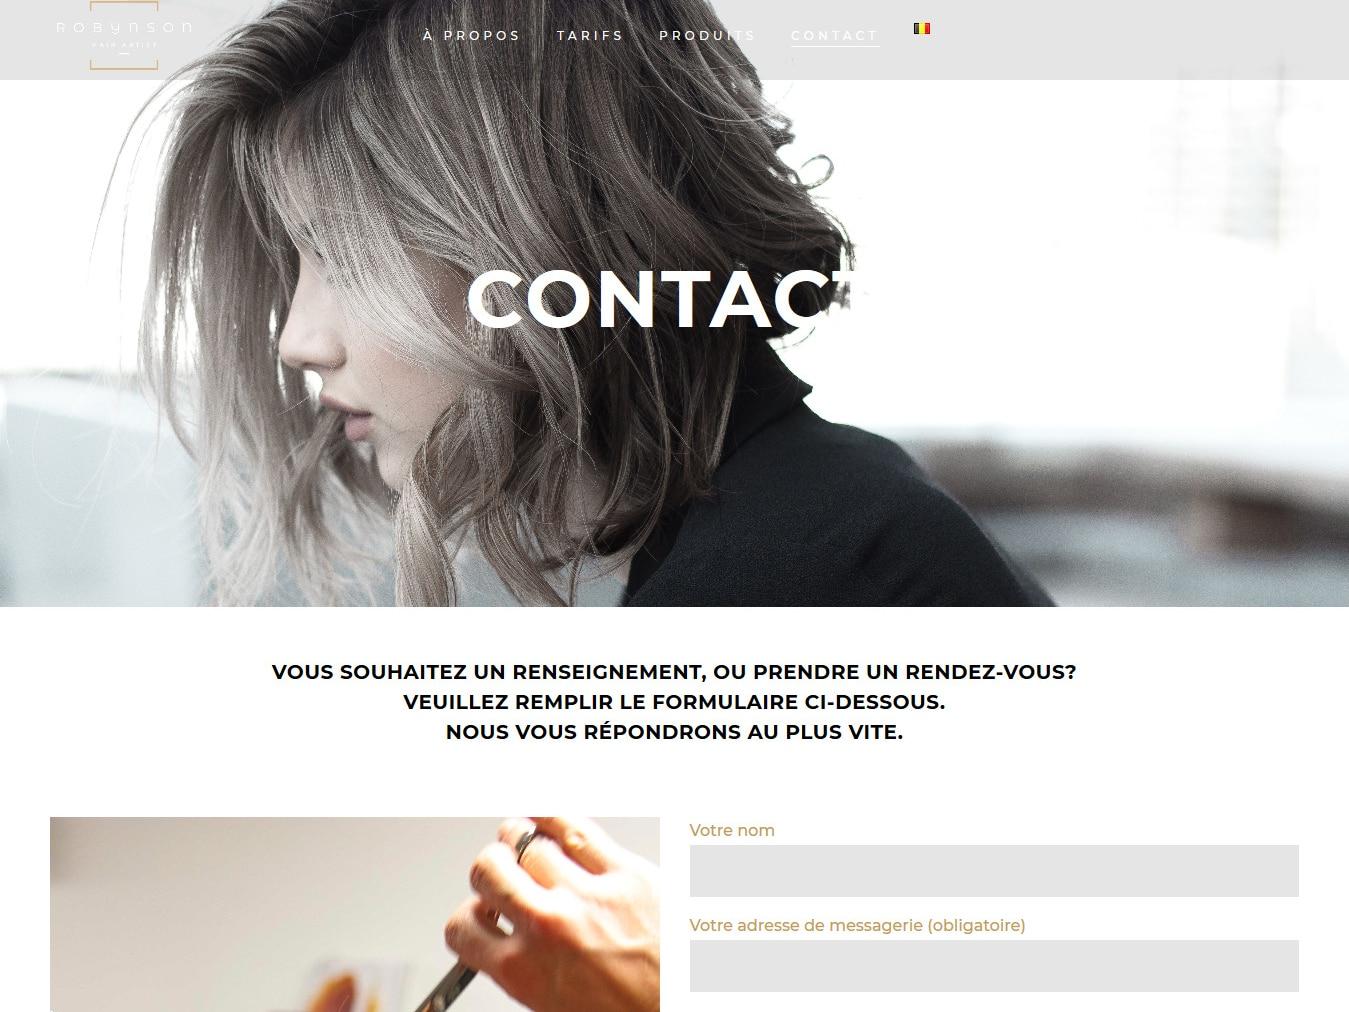 contact_rogné_robyn